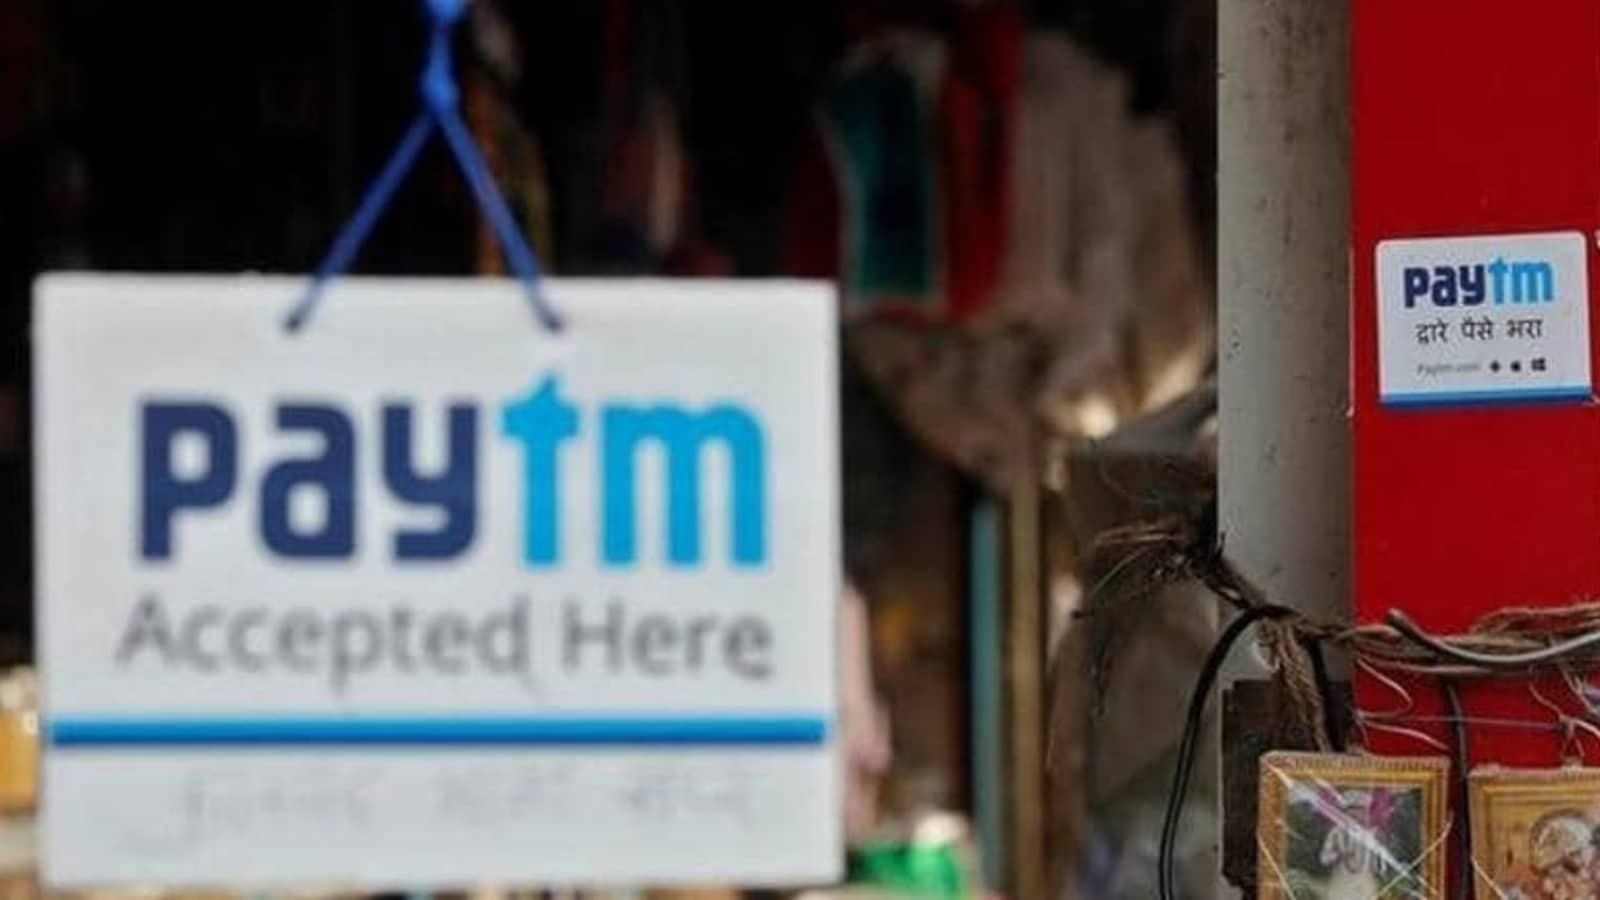 Paytm gets board nod to go public thumbnail